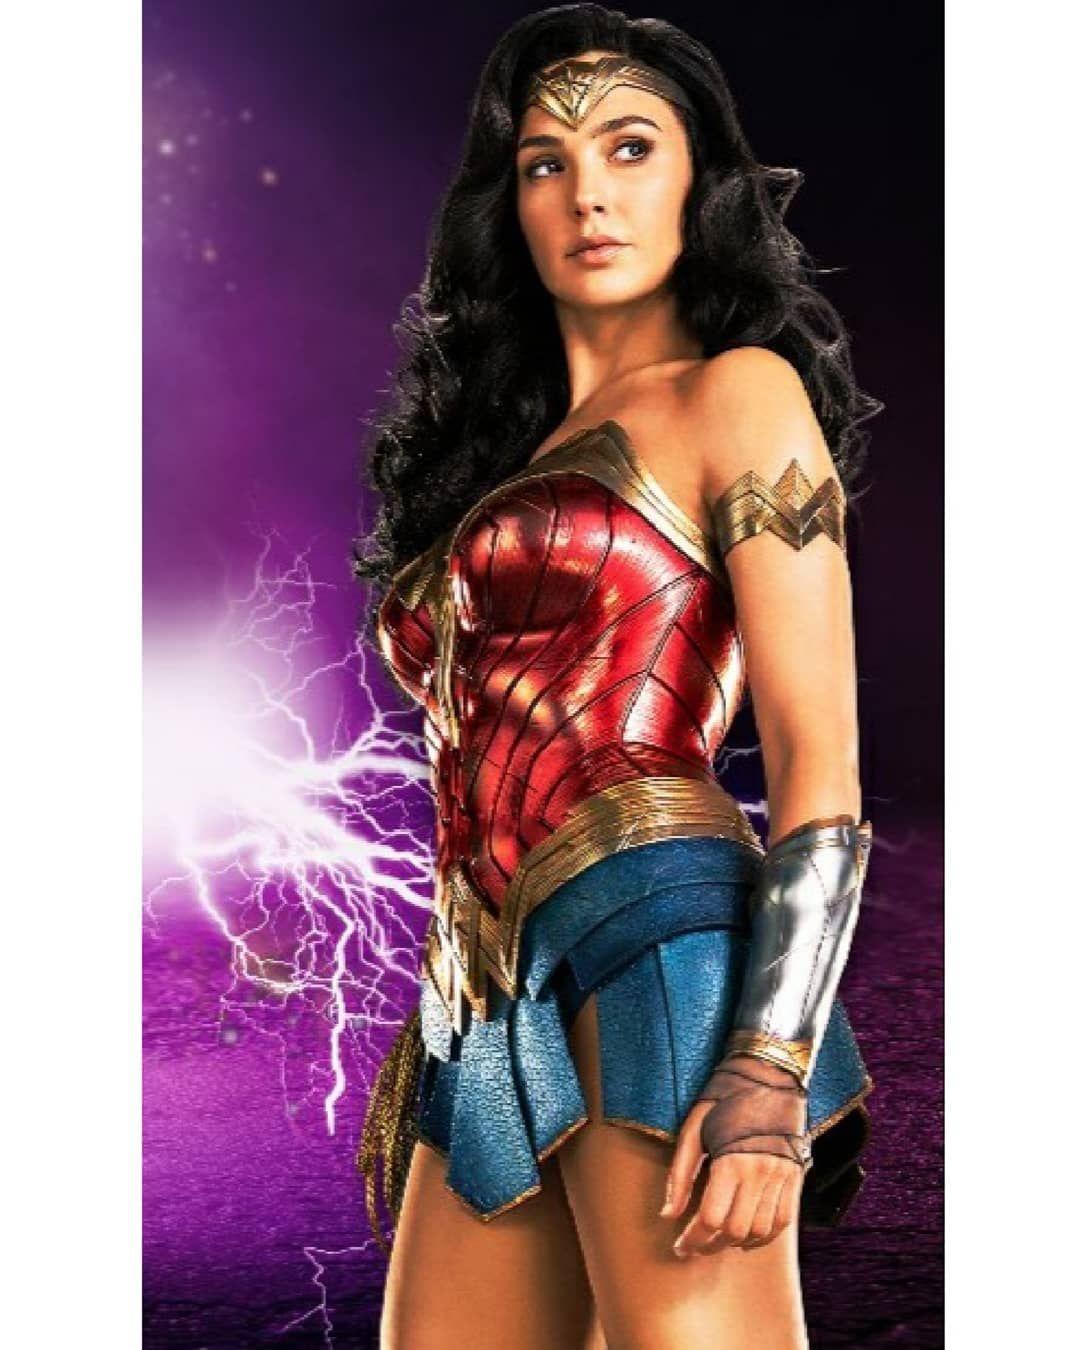 675 Me Gusta 22 Comentarios Comic Fanpage Courts 022 En Instagram New Wonder In 2020 Gal Gadot Wonder Woman Justice League Wonder Woman Wonder Woman Outfit